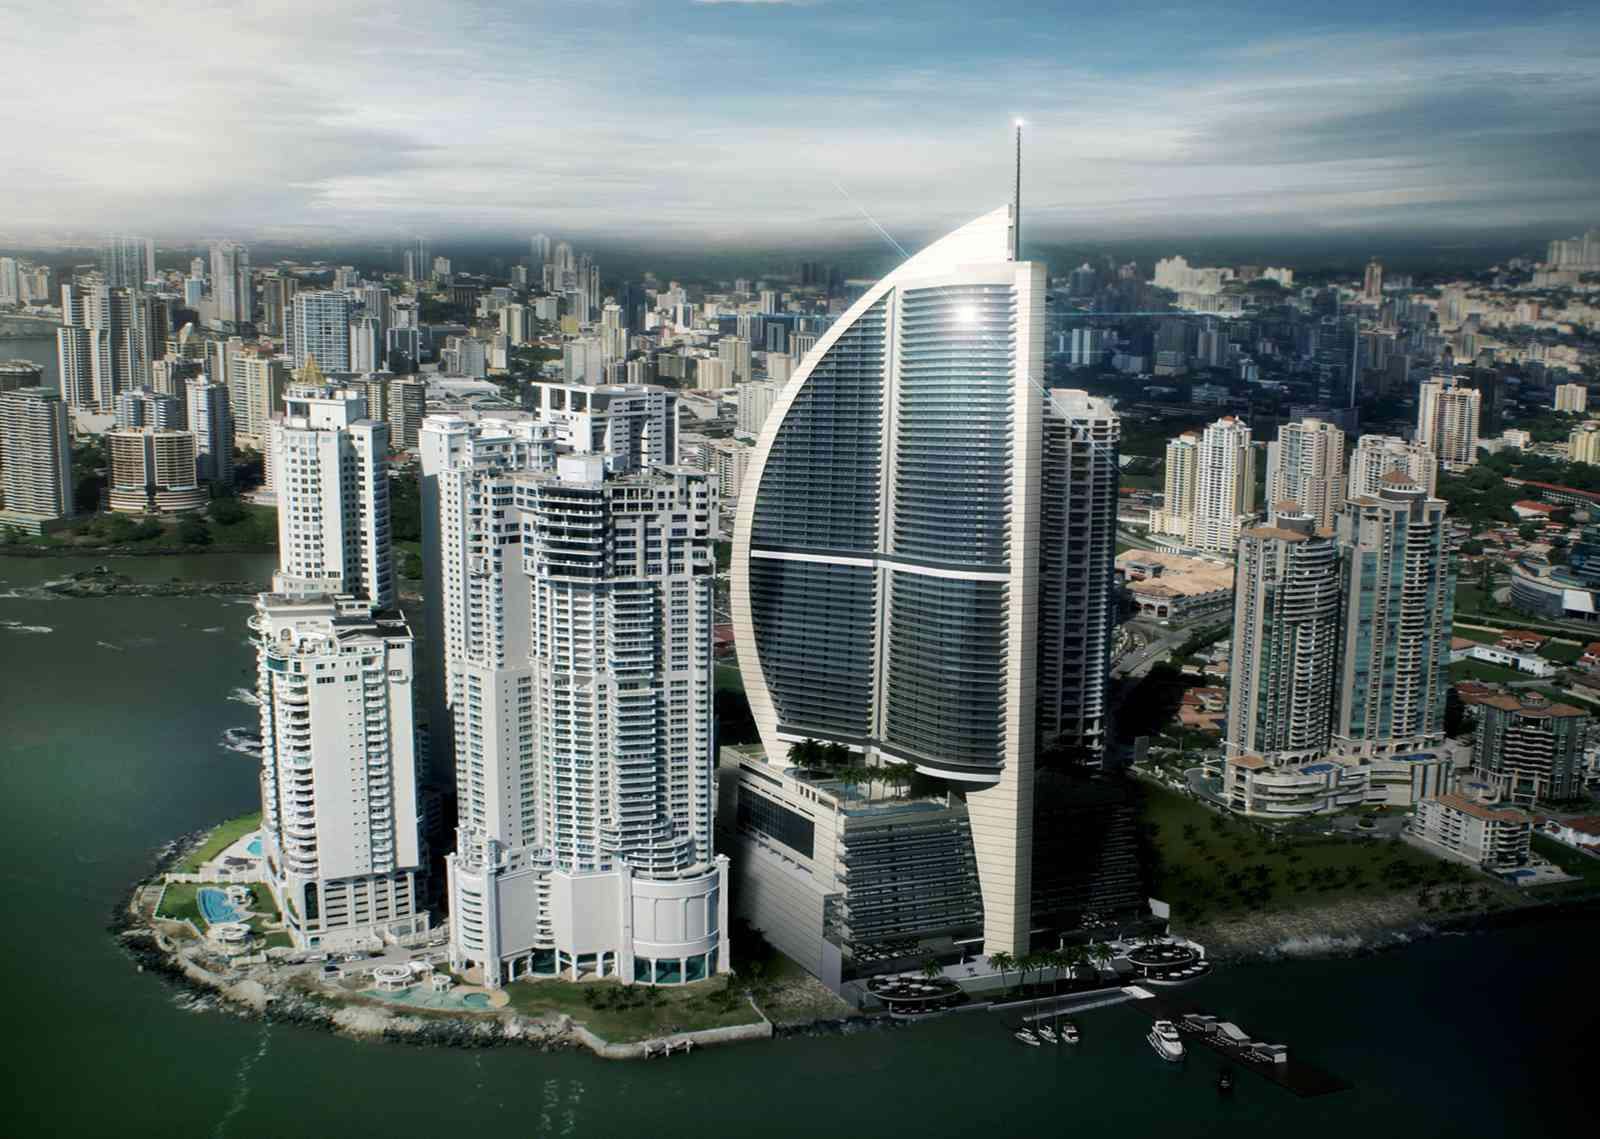 Aerial view of Trump Hotel Panama